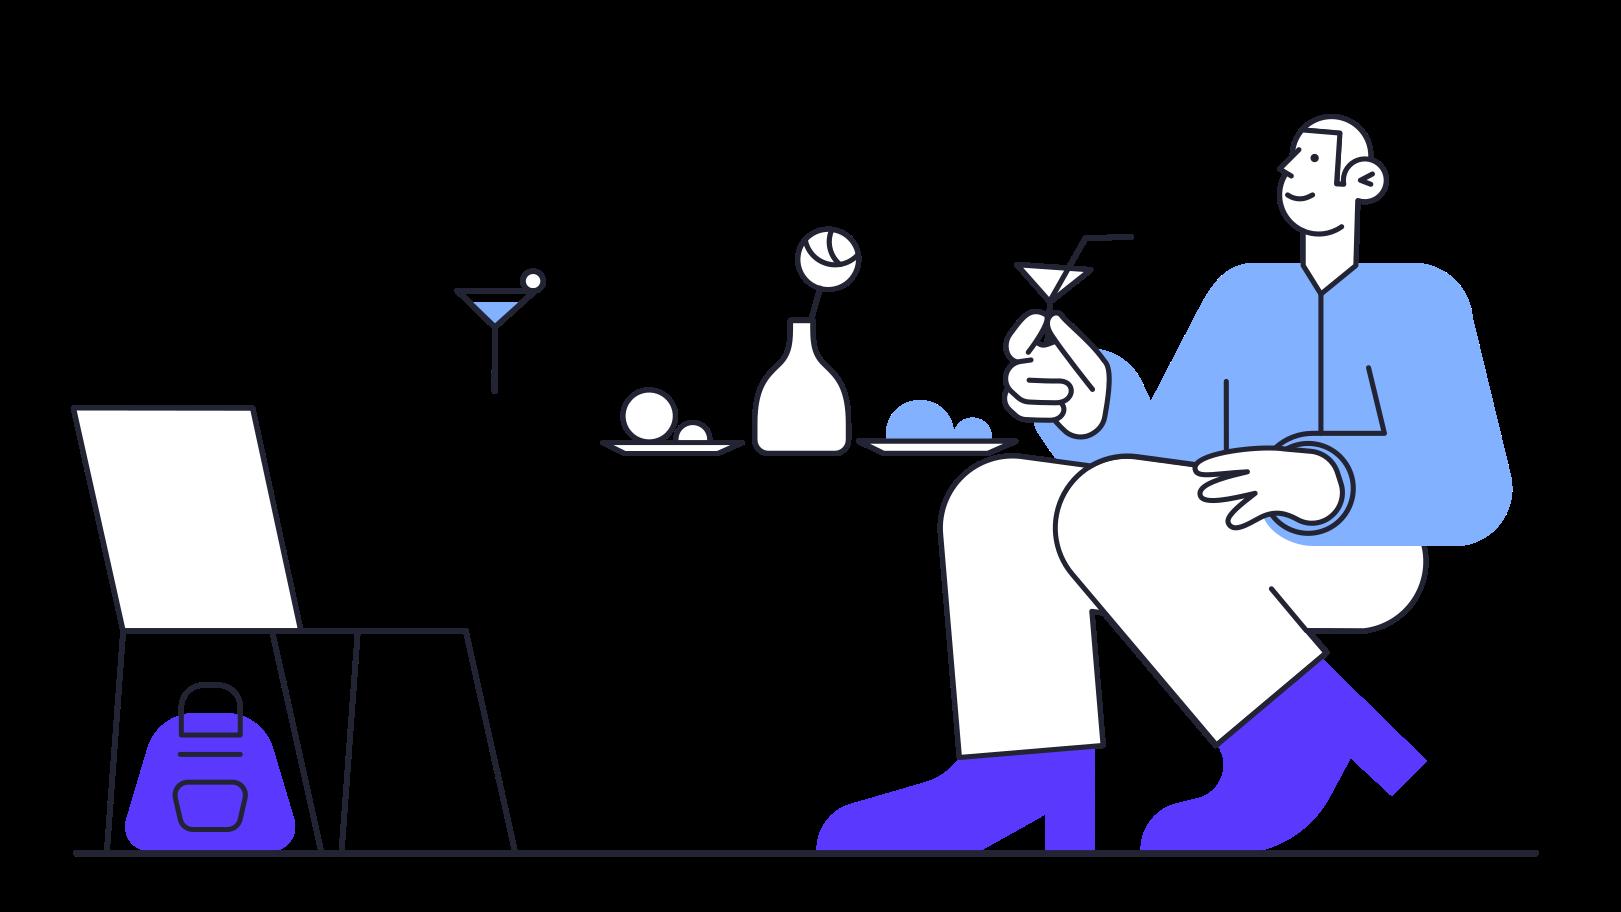 Order completed Clipart illustration in PNG, SVG